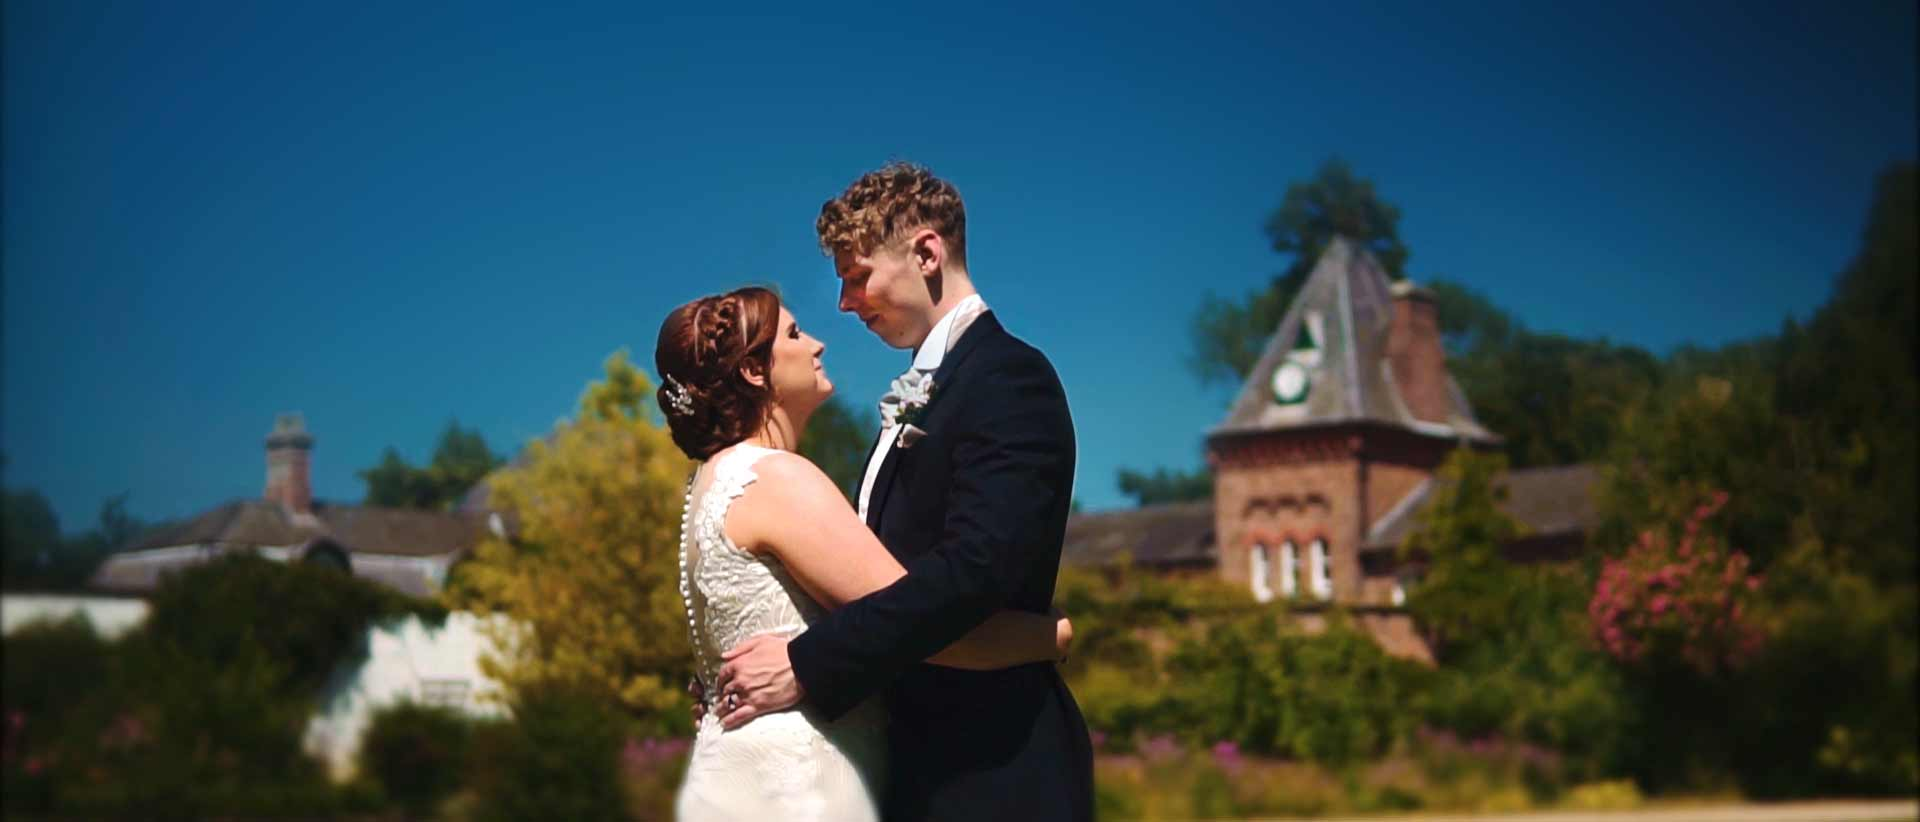 holly-jamie-wedding-solberge-hall-wedding-videographer-lincolnshire-pocket-jacks-films-bride-groom-embrace.jpg